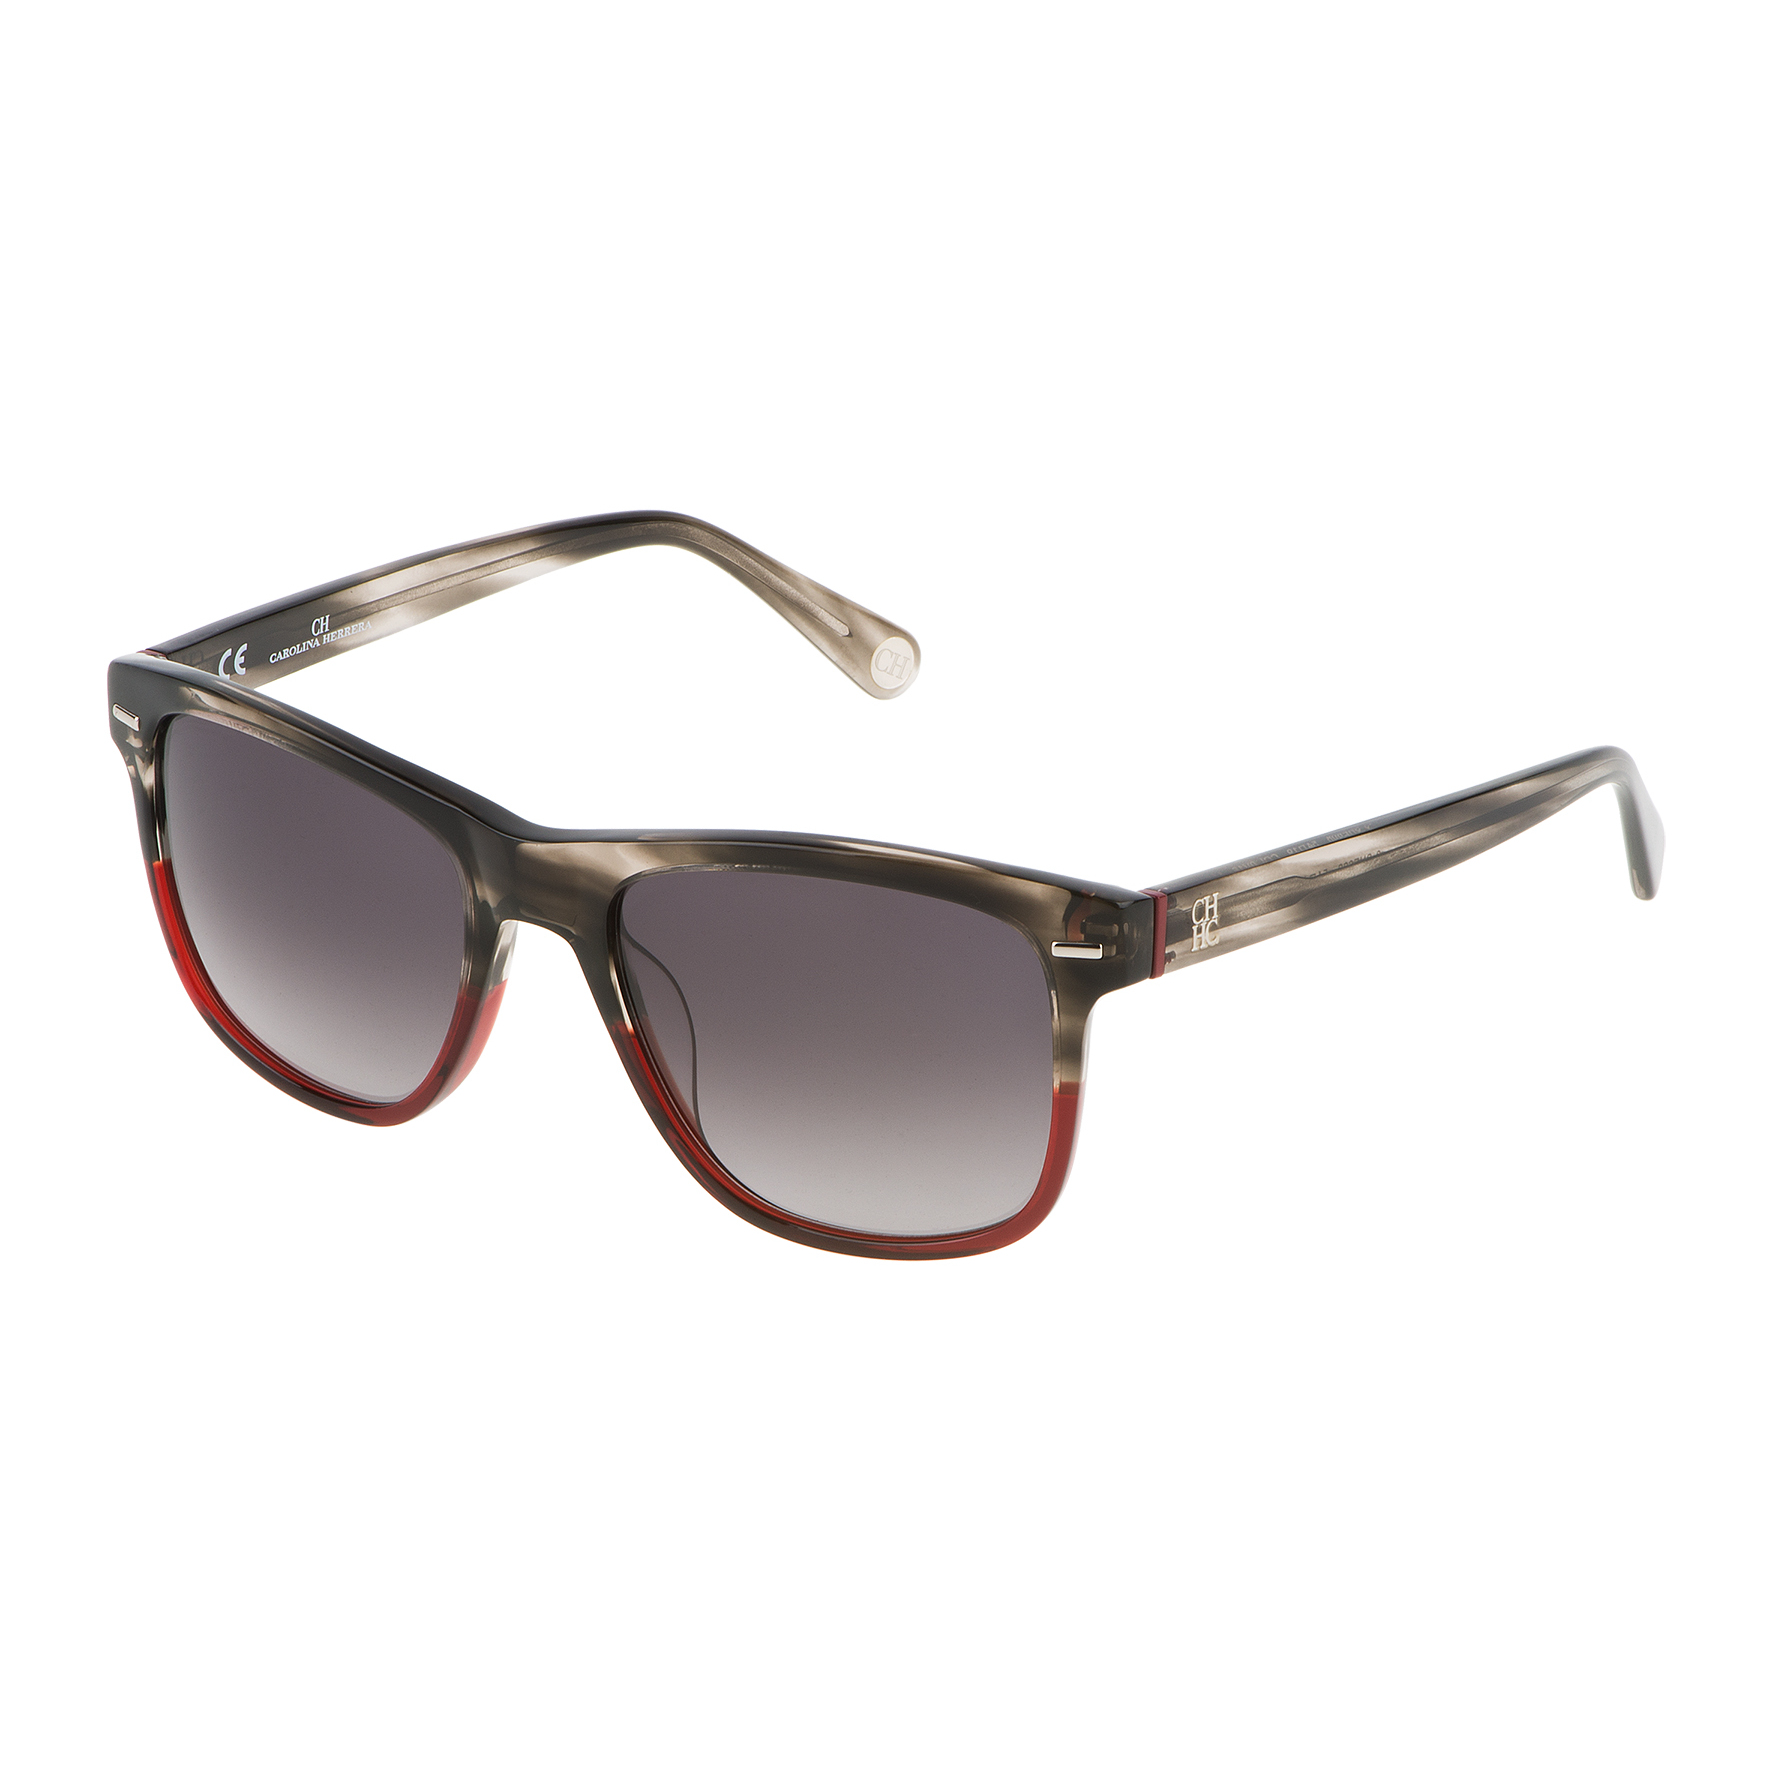 Glasses Woman Carolina Herrera She608540V16 50/22/145